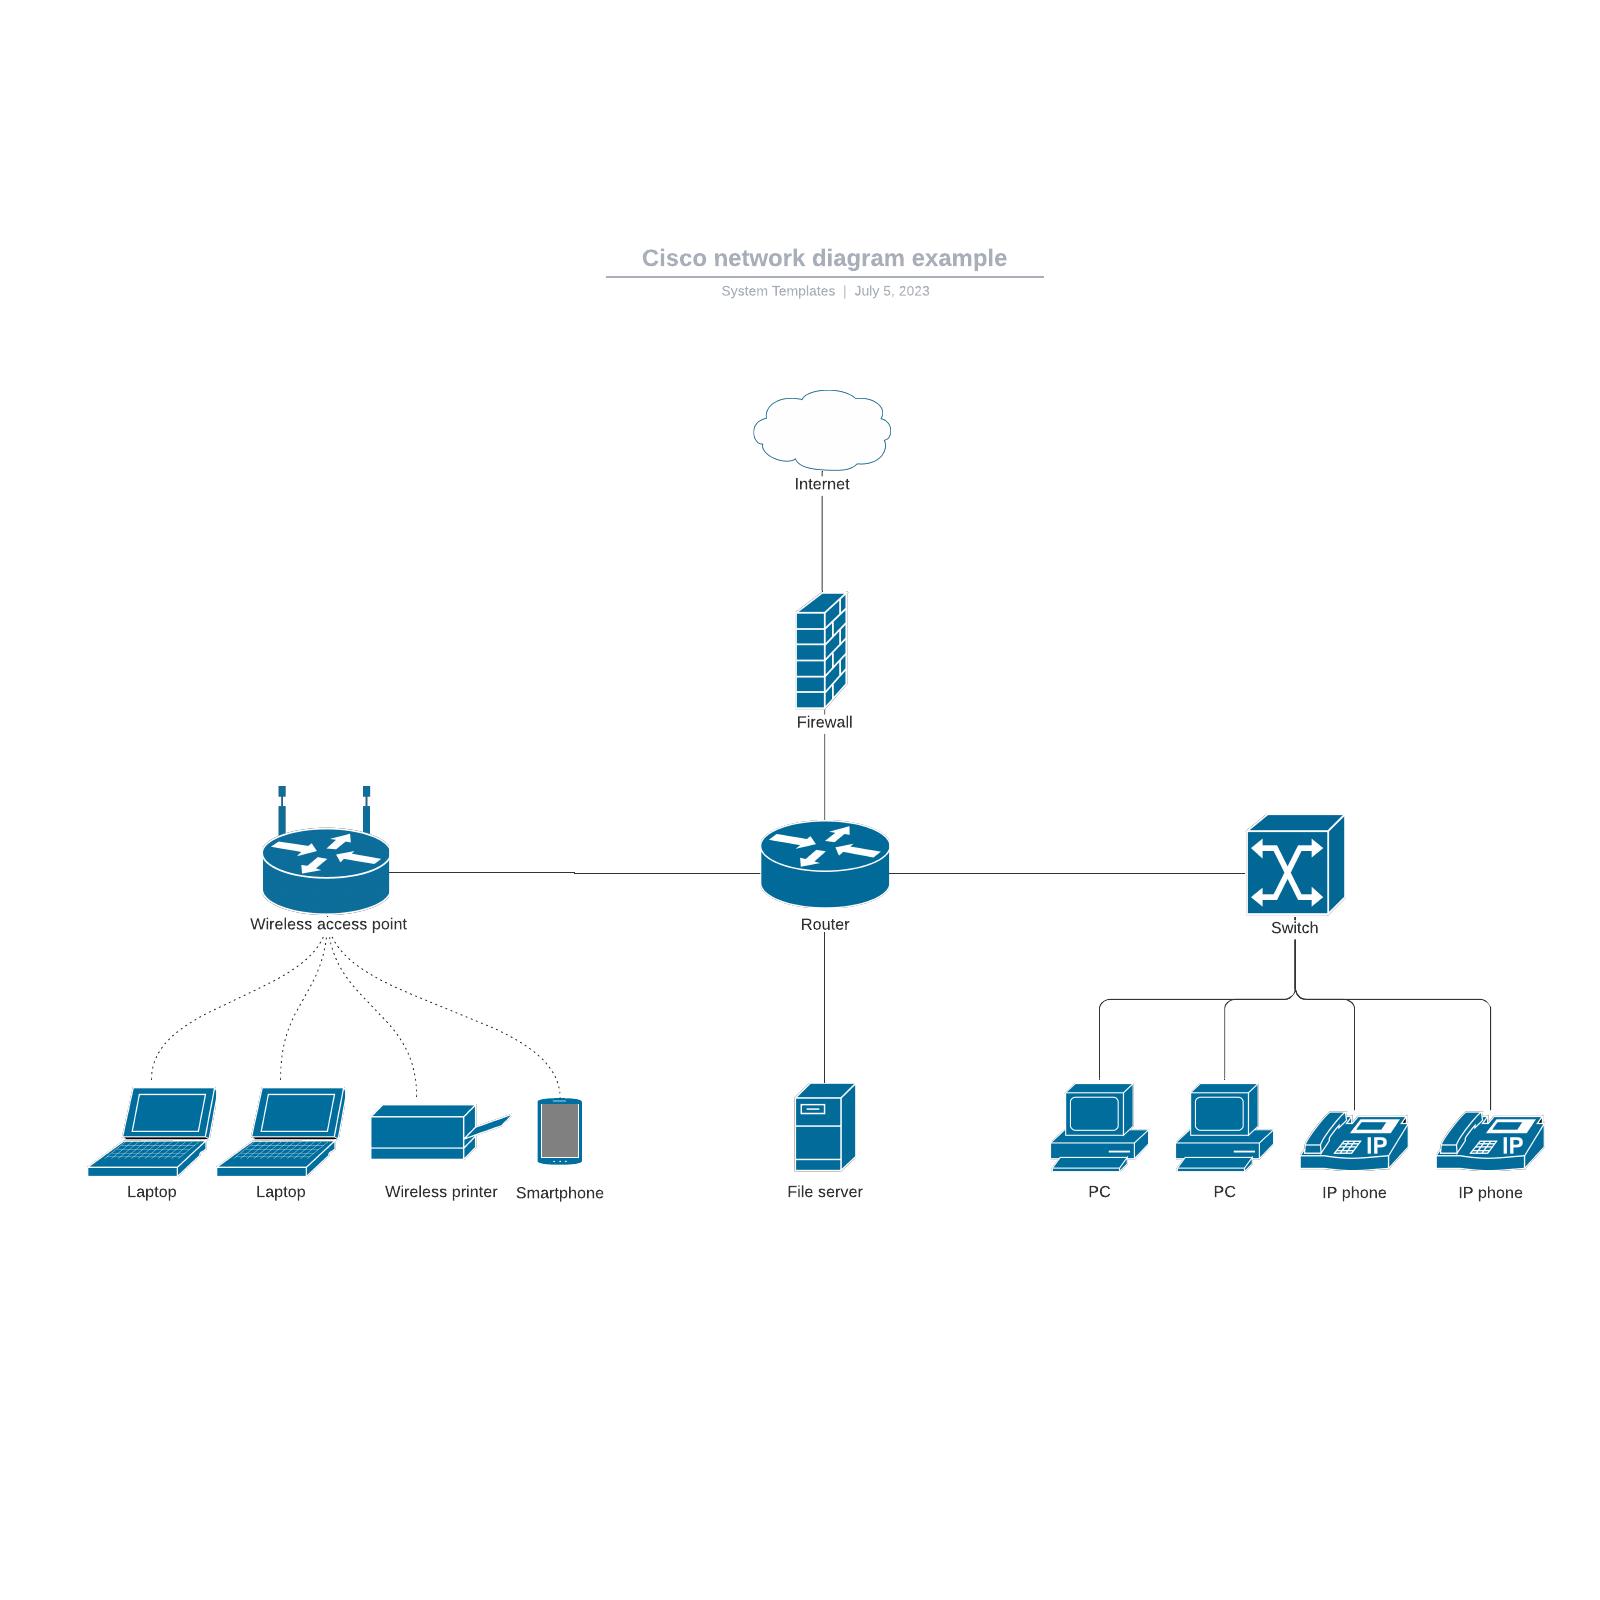 Cisco network diagram example